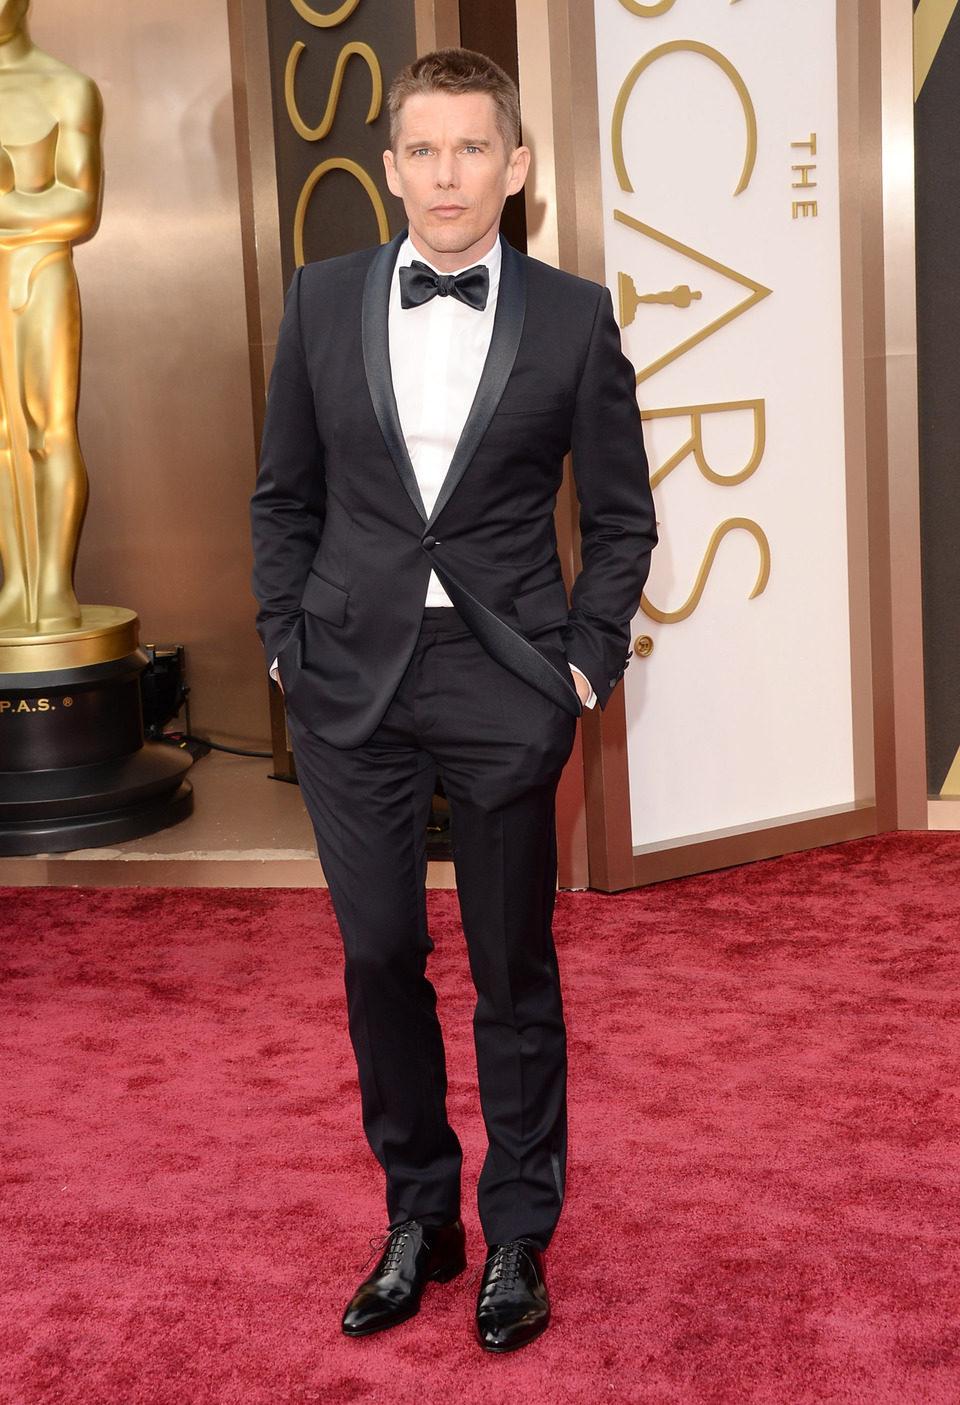 Ethan Hawke at the 2014 Oscars